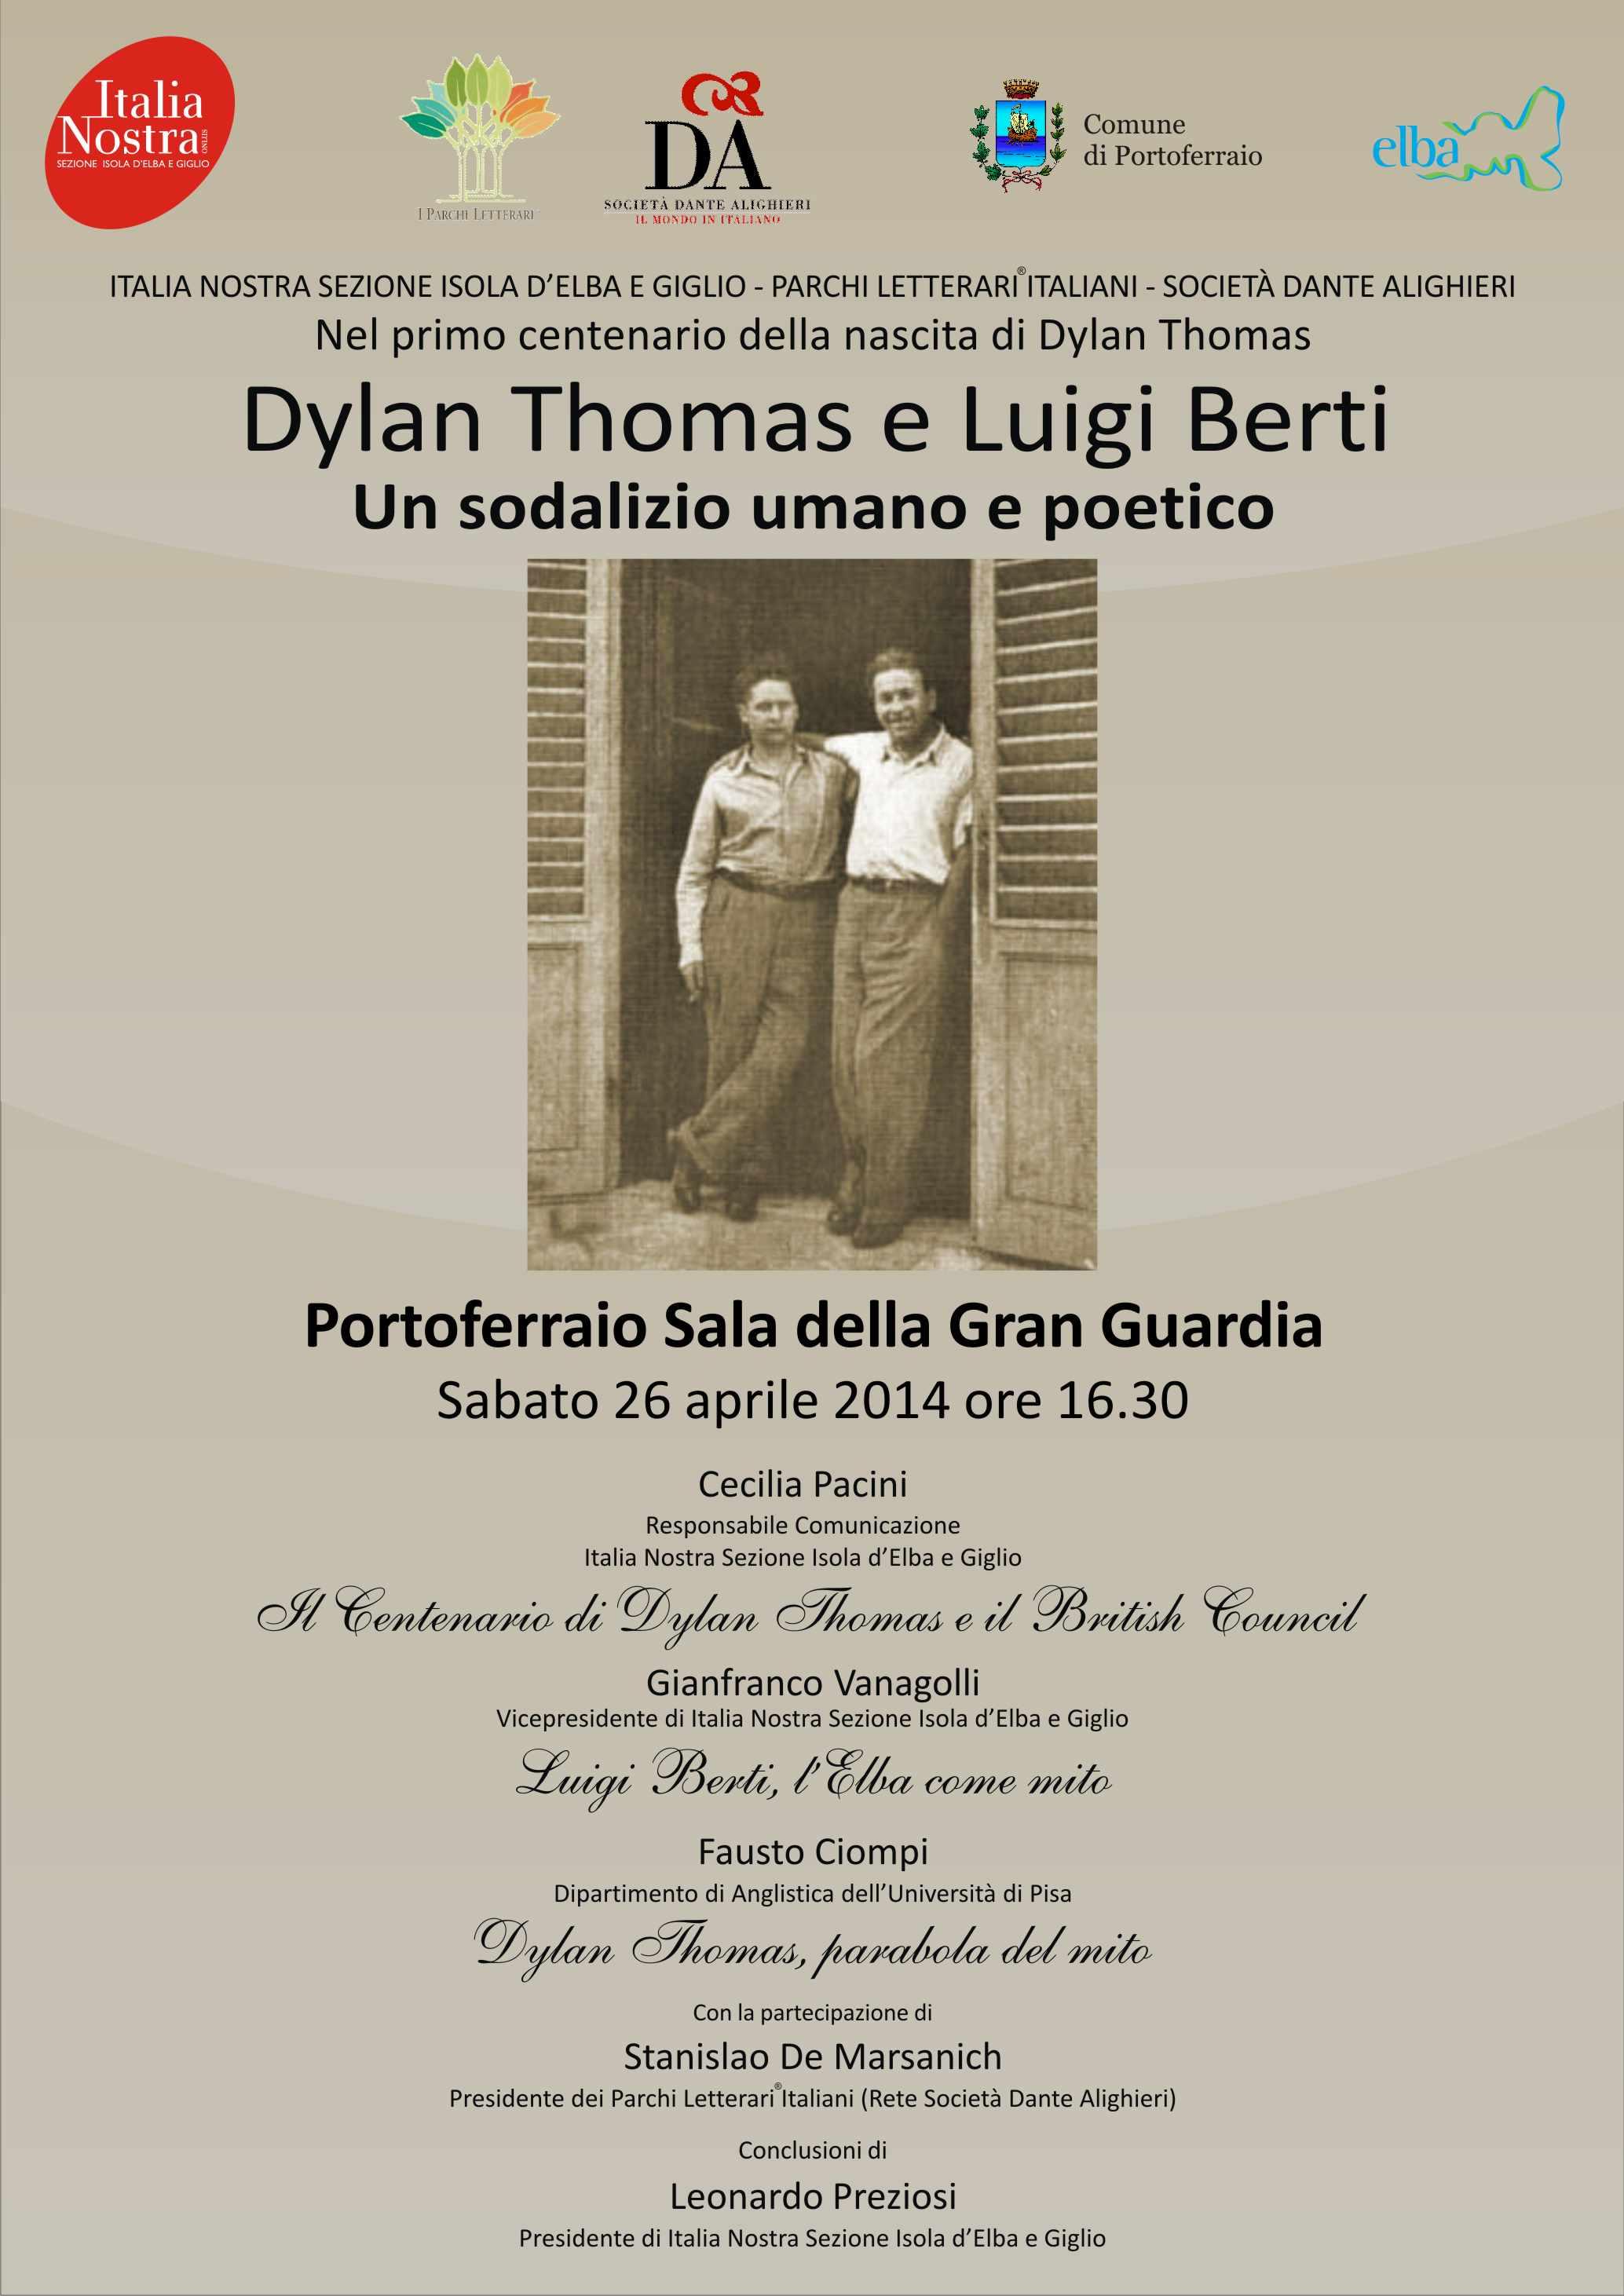 Dylan Thomas e Luigi Berti